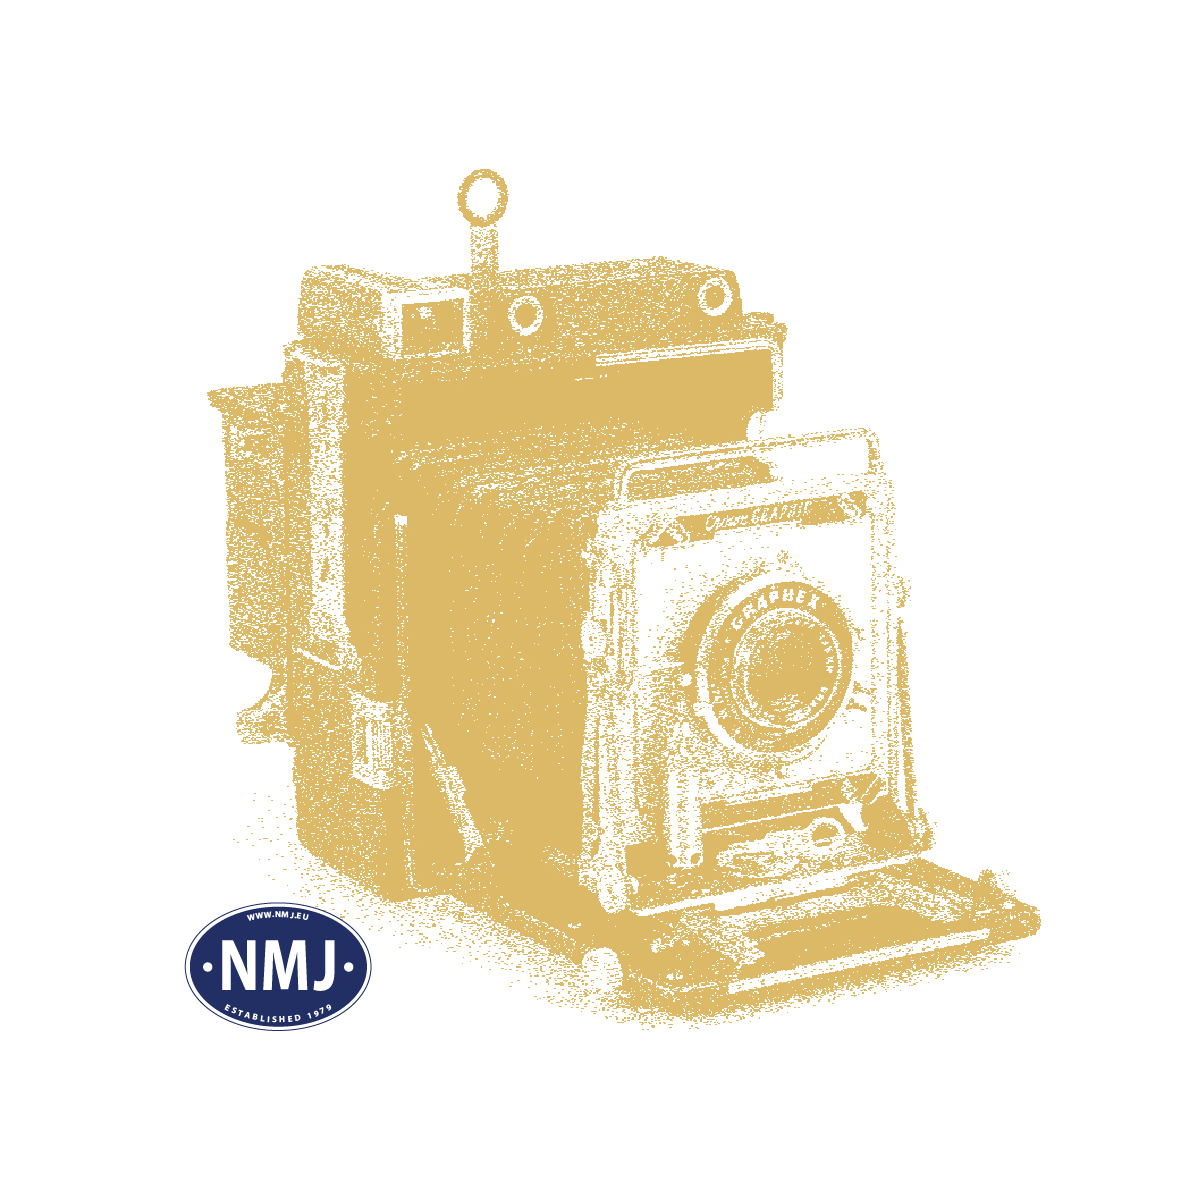 "NMJT90208 - NMJ Topline MAV M61.010, ""NMJ Special"", DC"